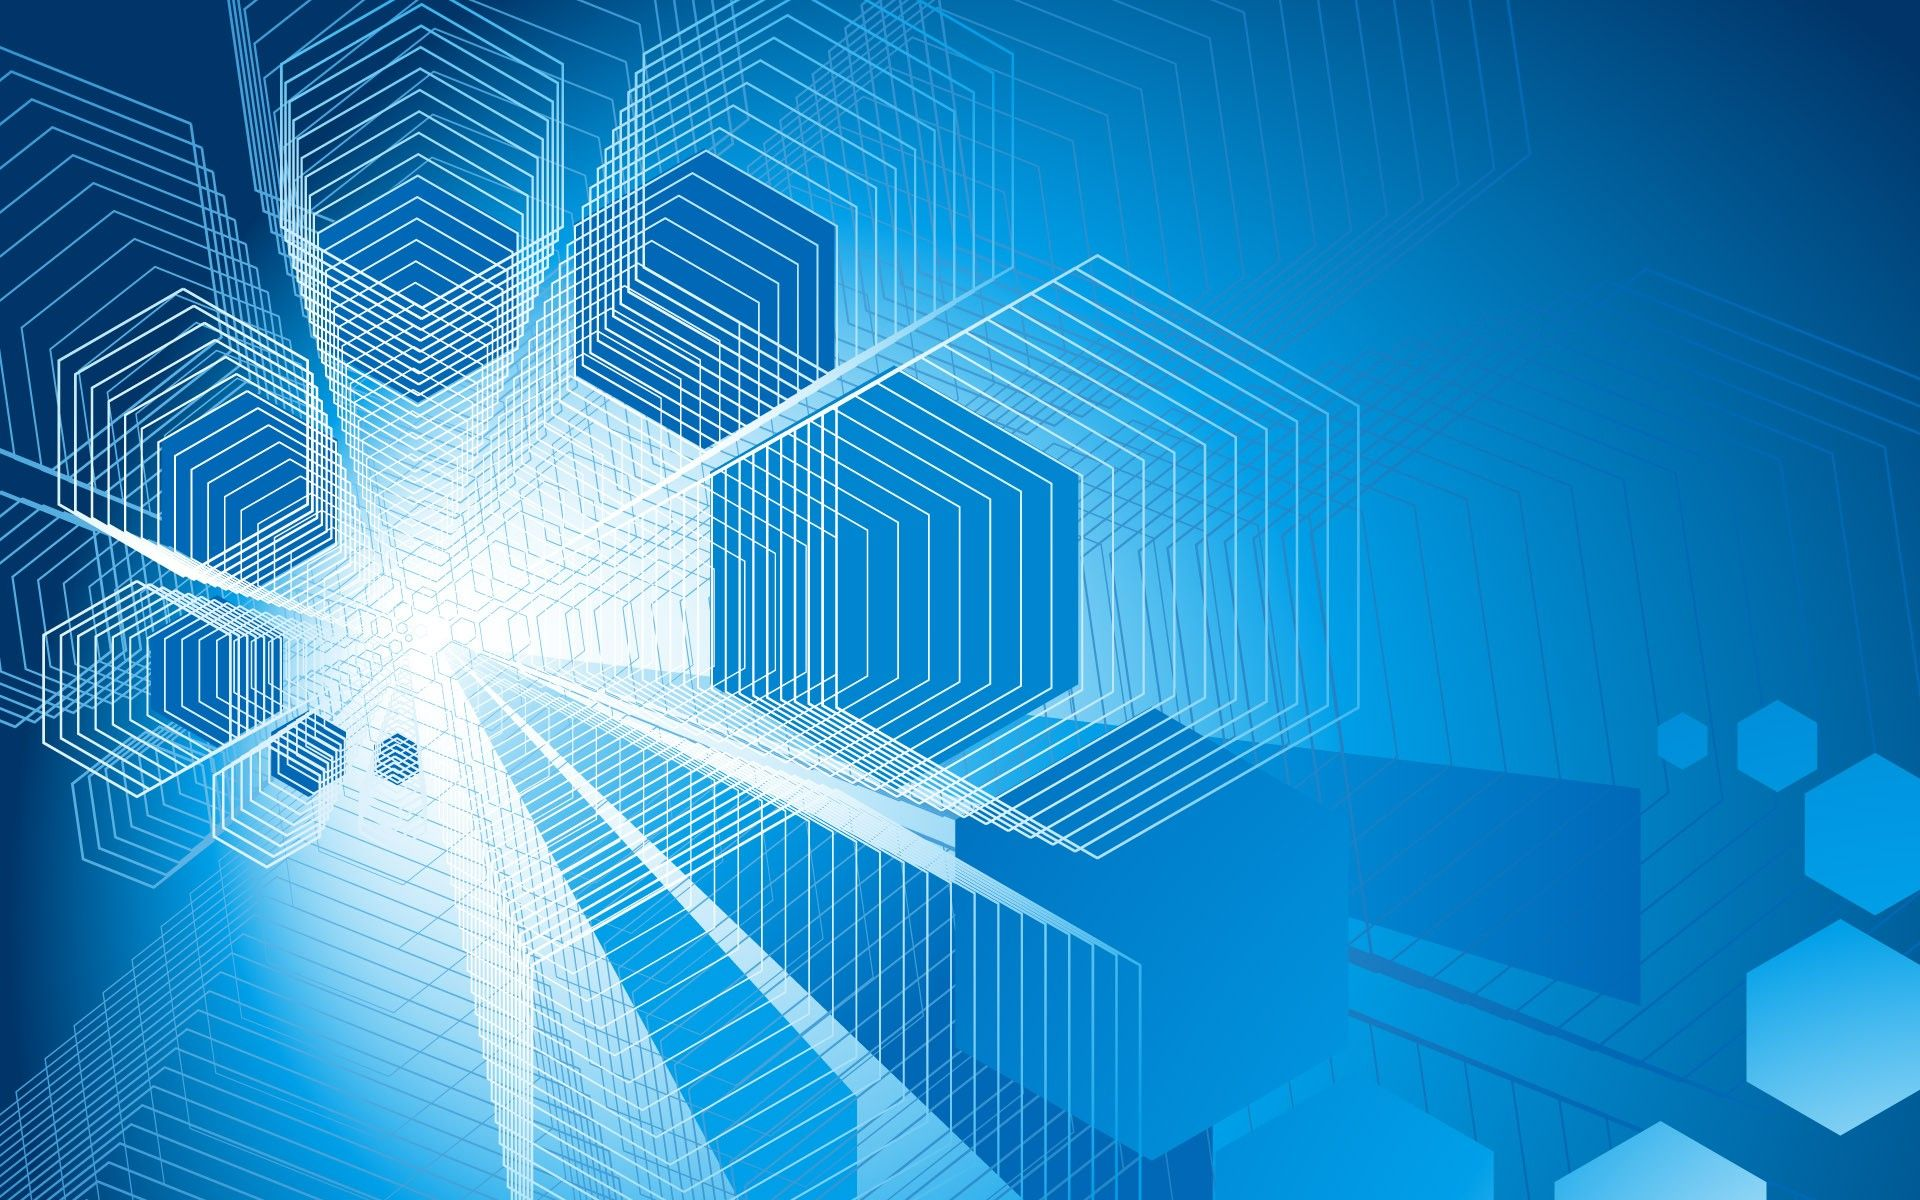 Hd wallpaper electronics - Hd Desktop Technology Wallpaper Backgrounds For Download 1600 900 Technology Wallpapers 43 Wallpapers